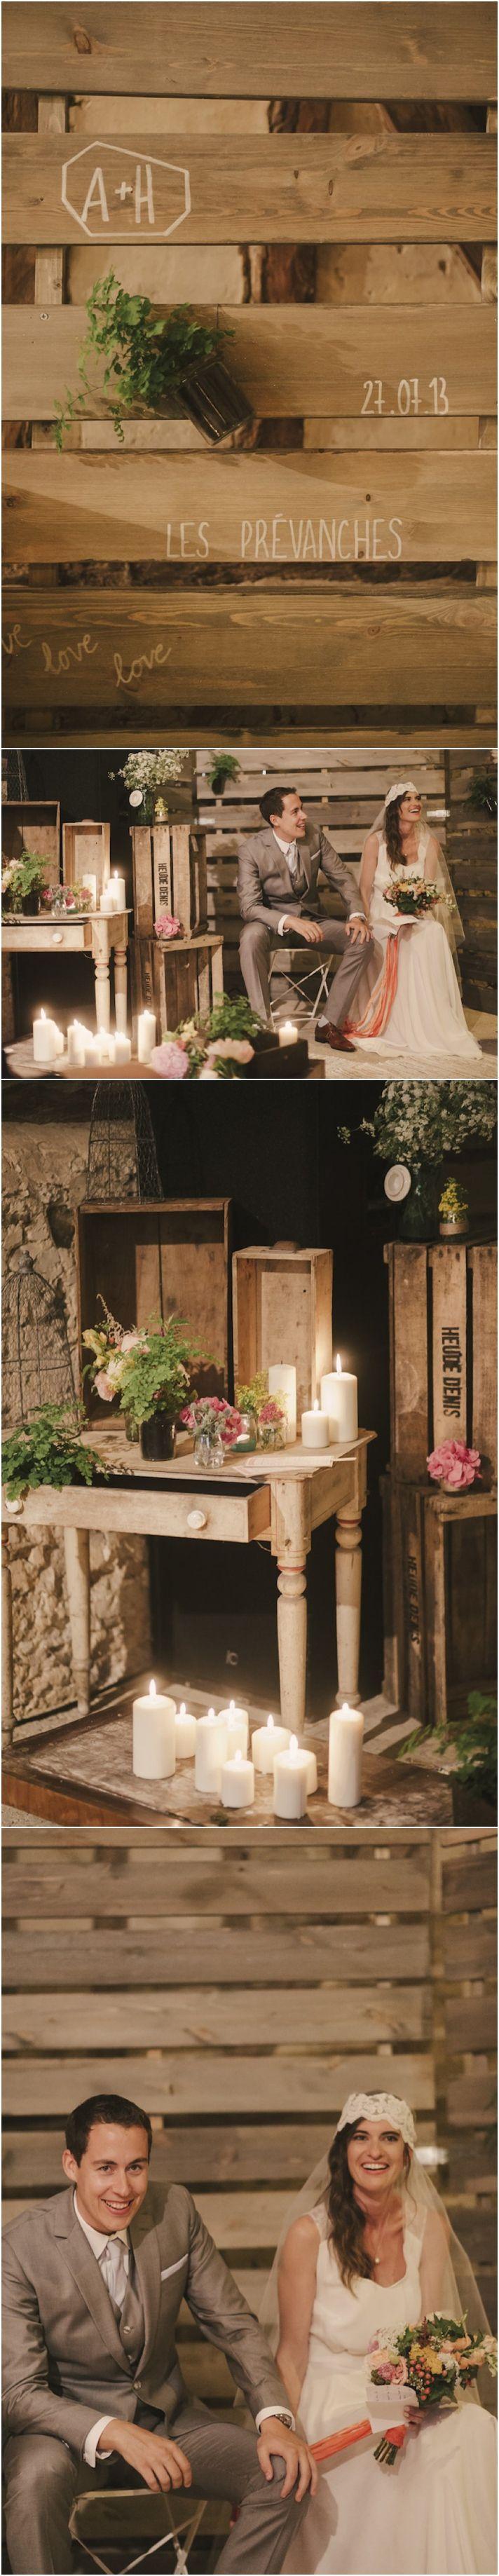 ©Lovelypics - mariage - Manoir des Prevanches - Normandie - Made in You - Le blog de Madame C